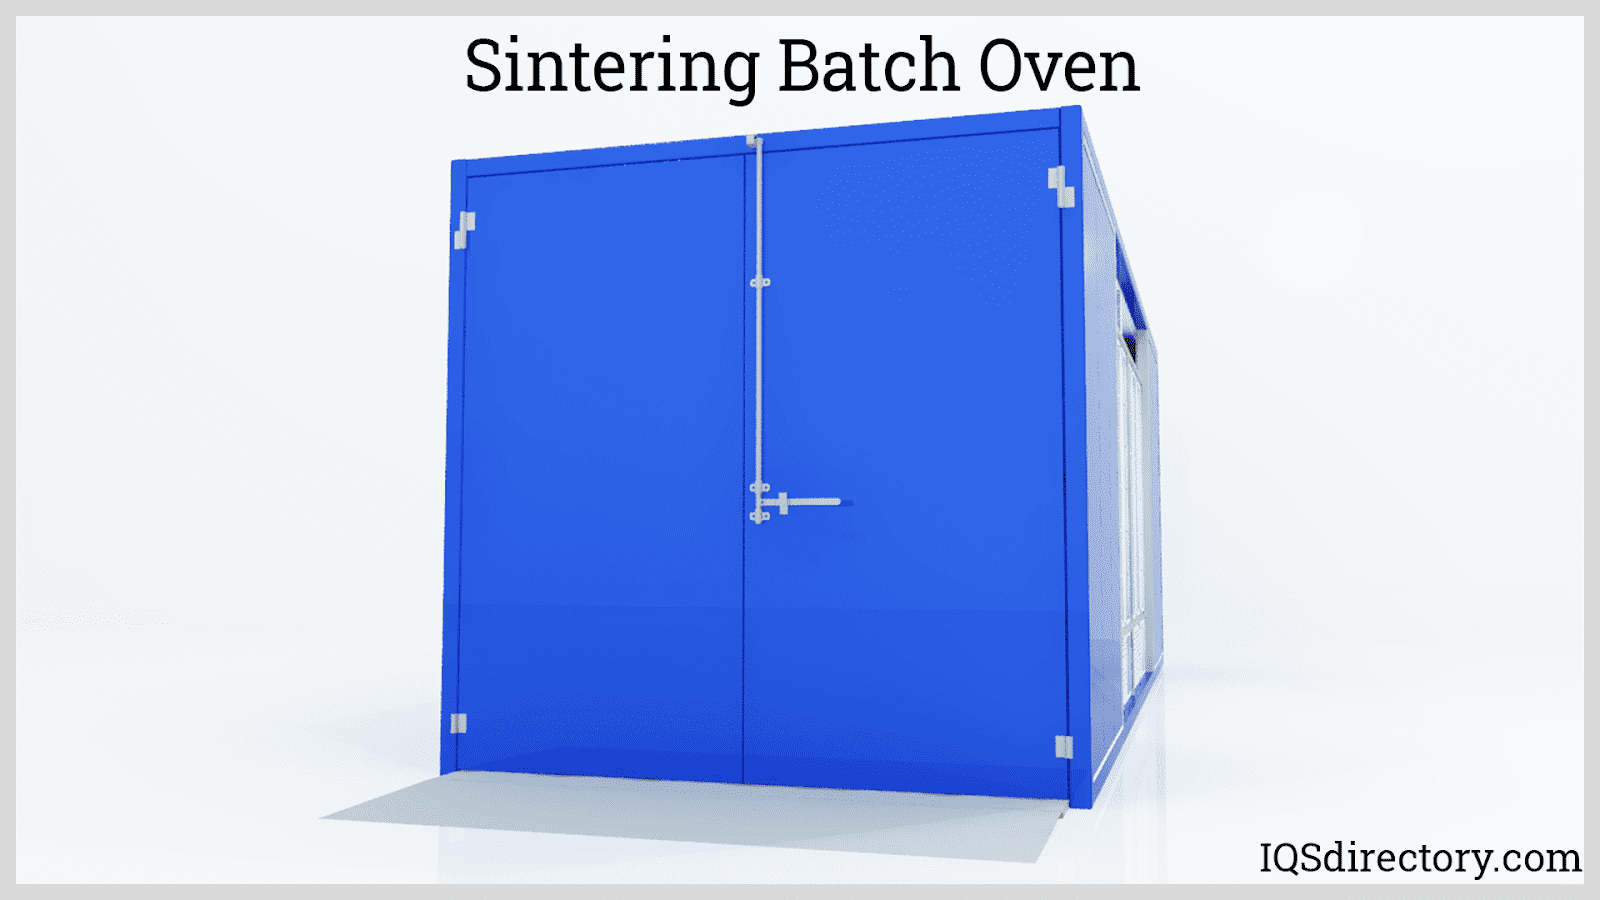 Sintering Batch Oven